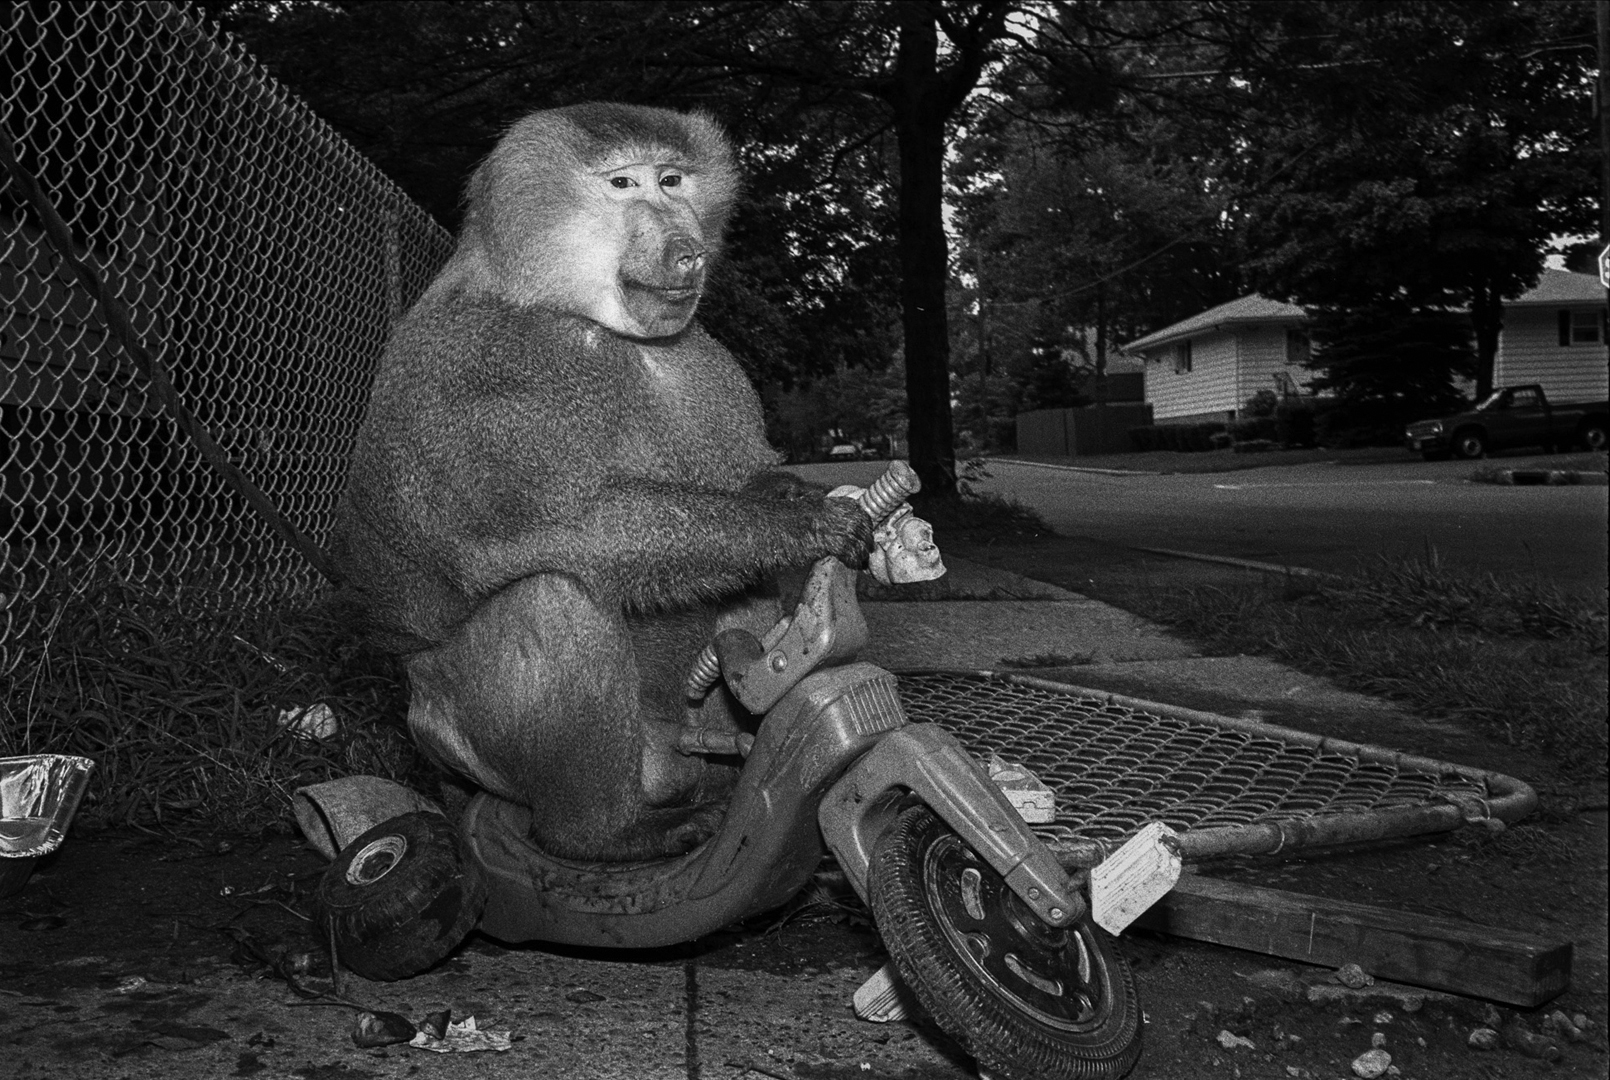 Pete, 1989. Hamadryas baboon, male, 5 years old.